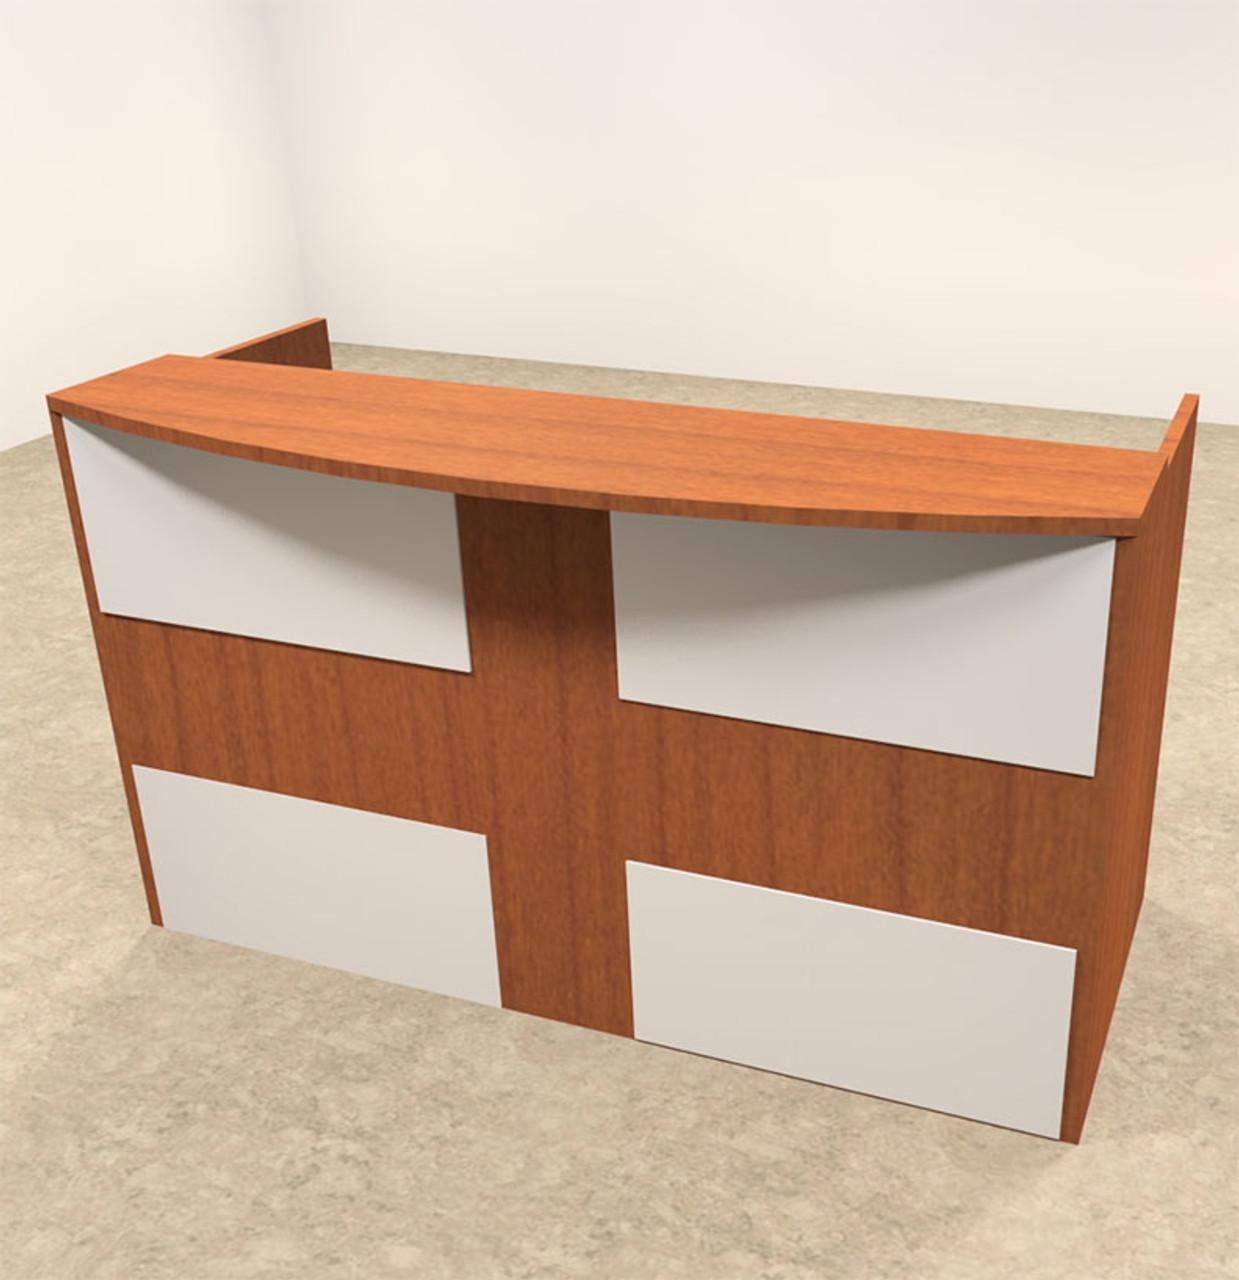 2pc Rectangular Modern Acrylic Panel Office Reception Desk, #OT-SUL-R13